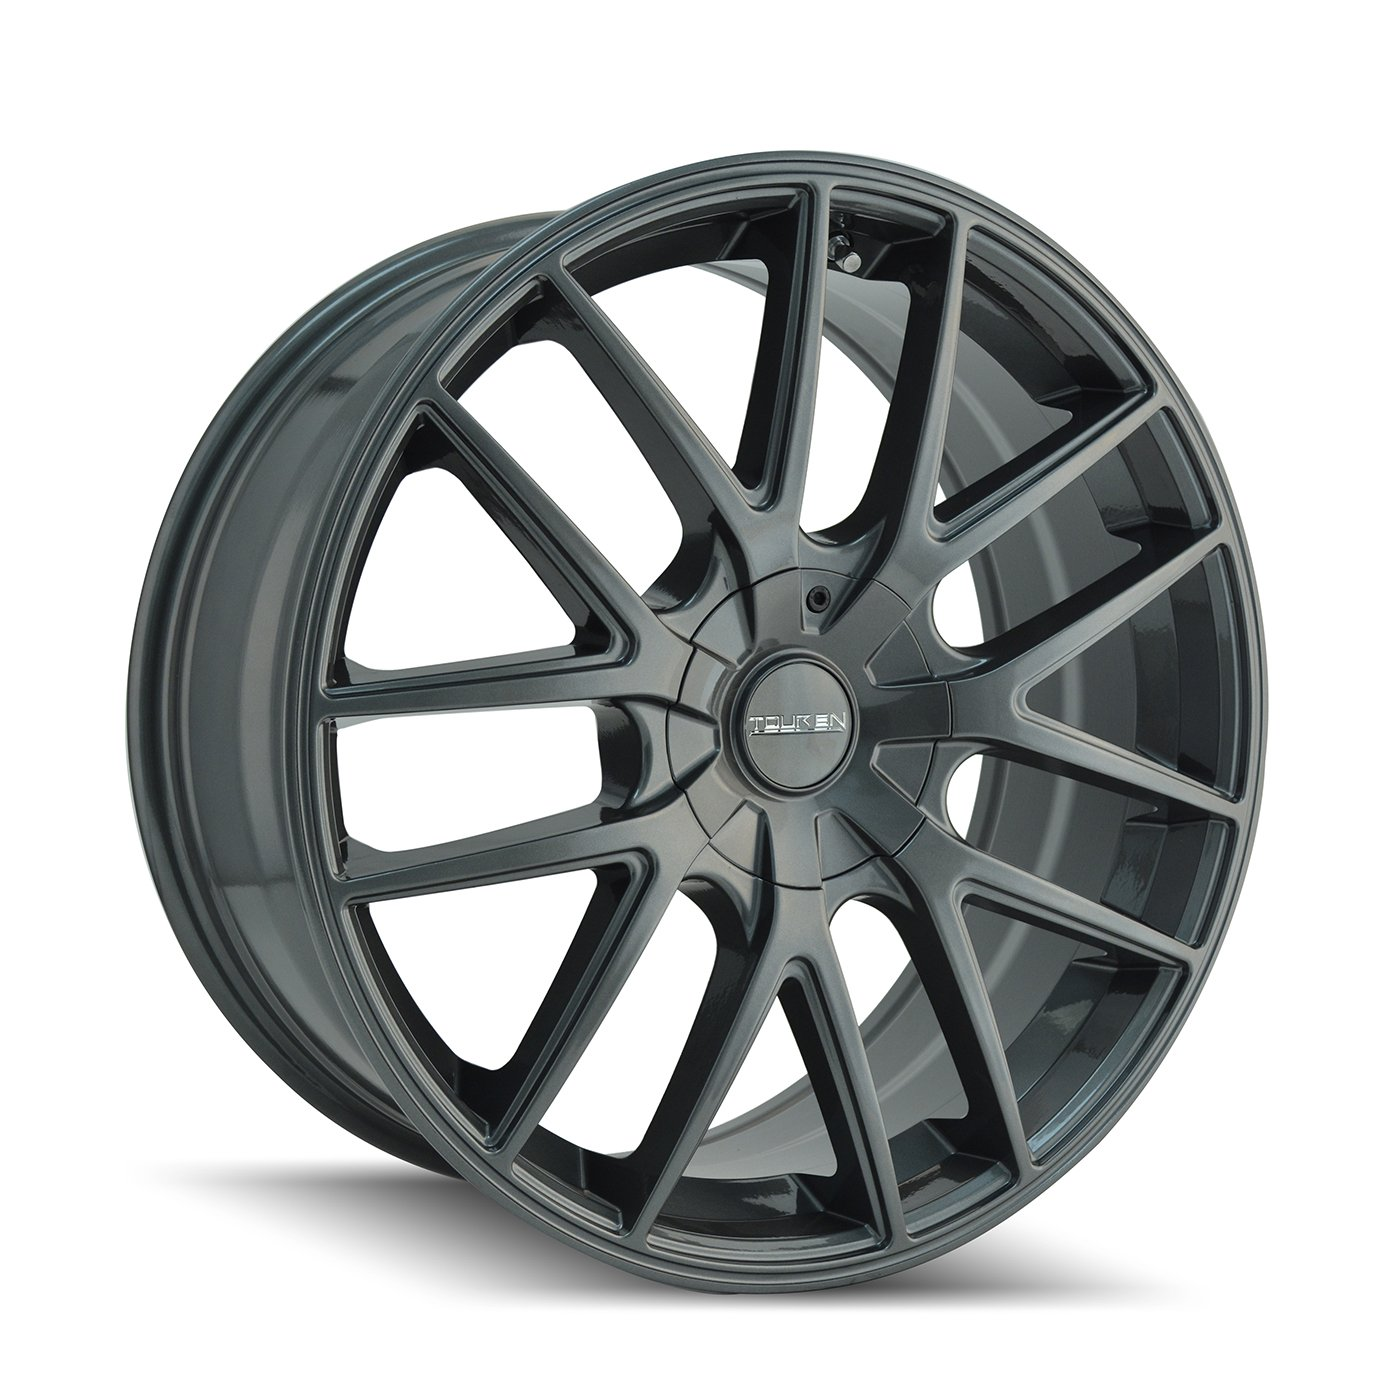 Touren TR60 3260 Wheel with Gunmetal Finish (18x8''/5x108mm)